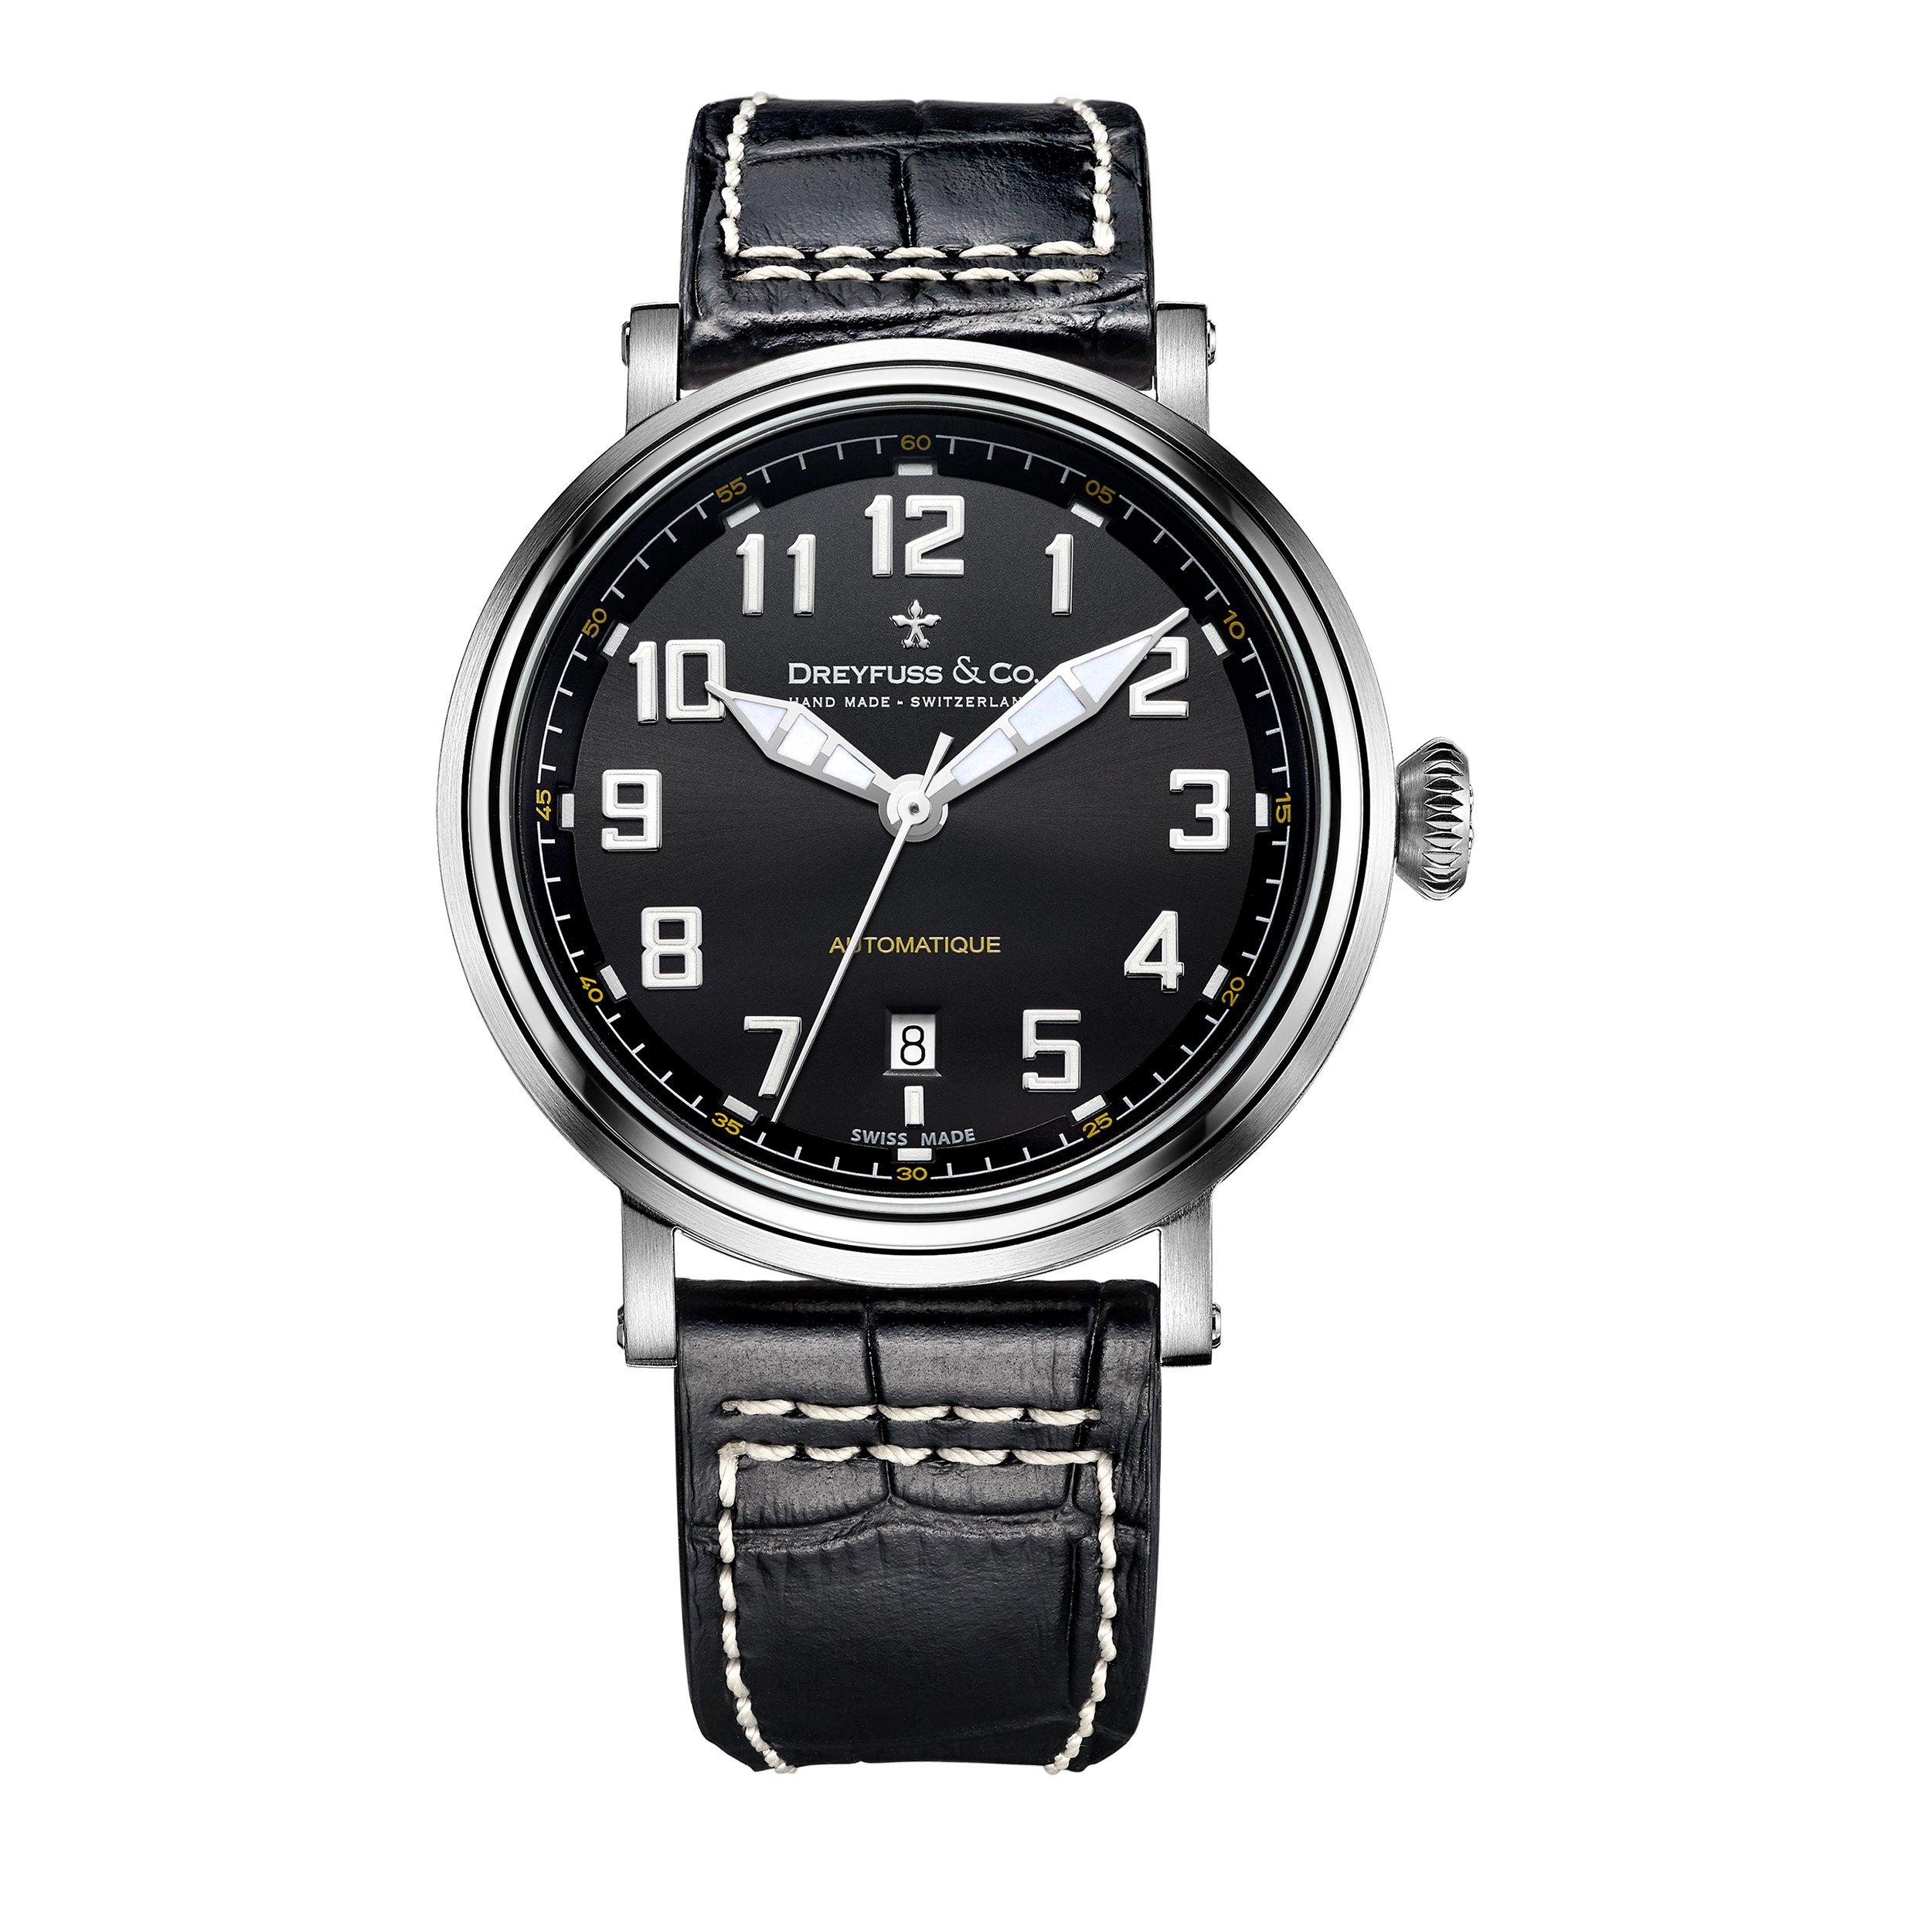 Dreyfuss-Herren-Datum-klassisch-Automatik-Uhr-mit-Leder-Armband-DGS0015319